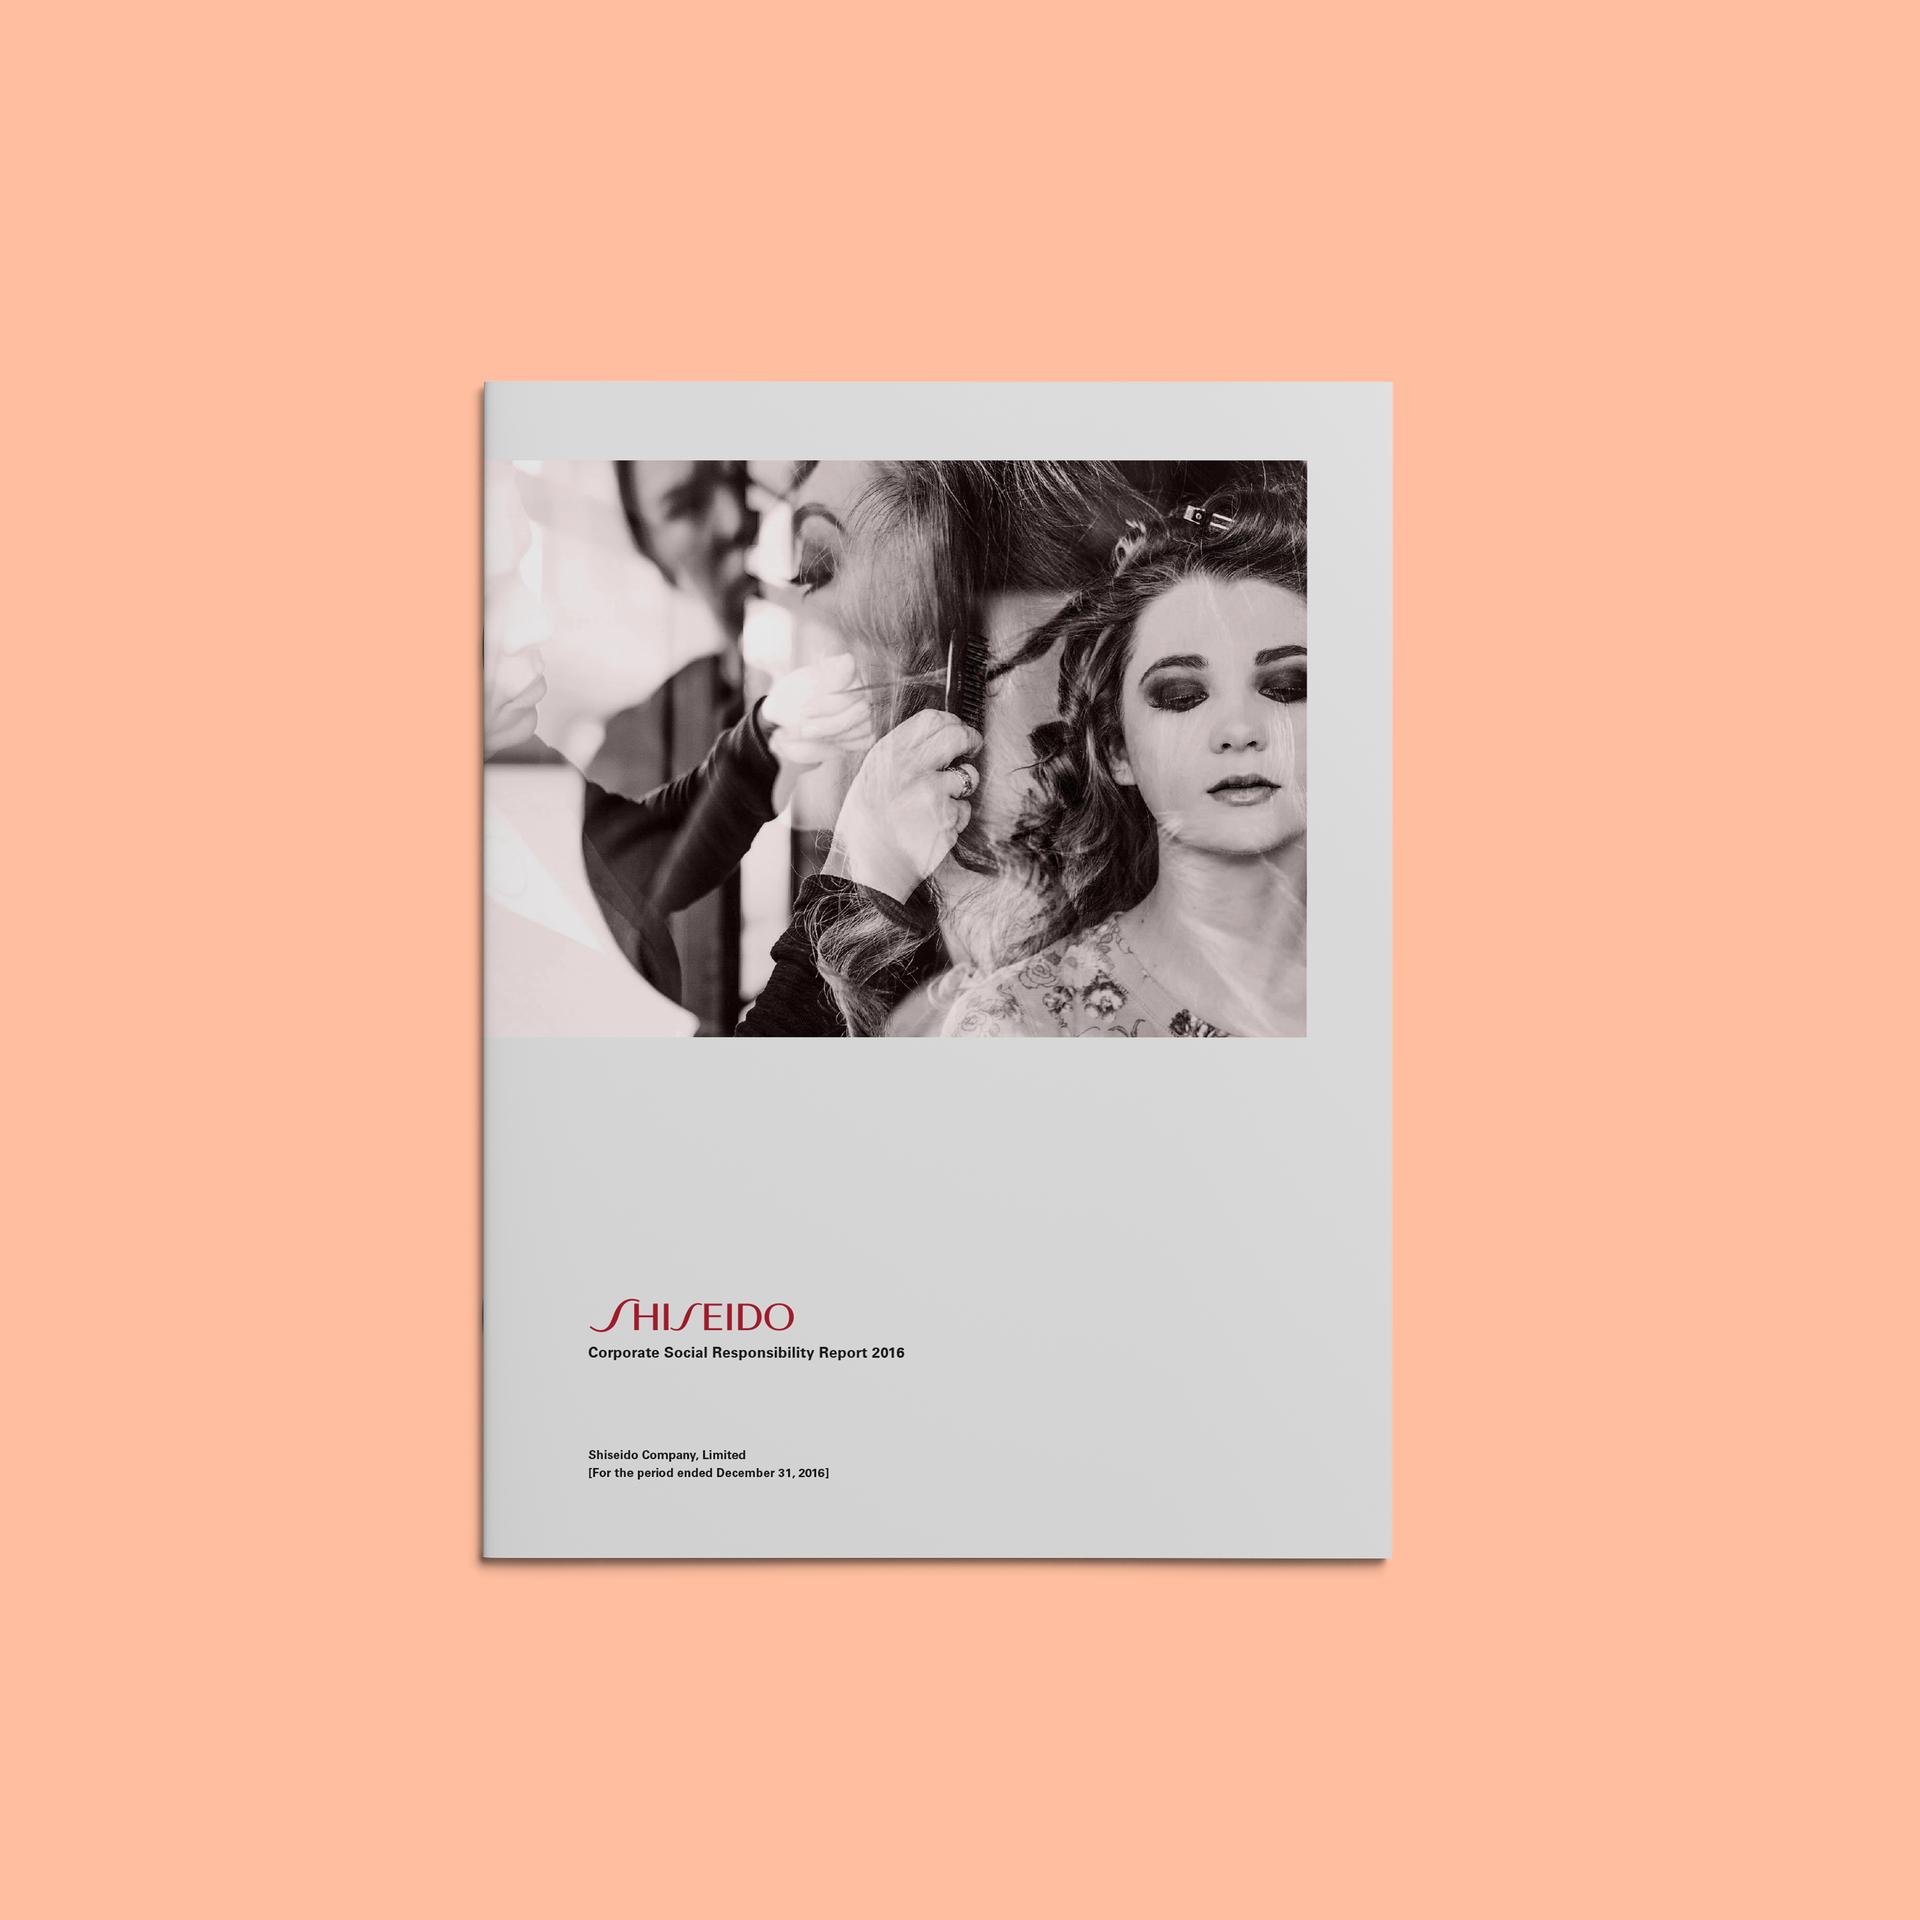 Shiseido Social Responsibility Report